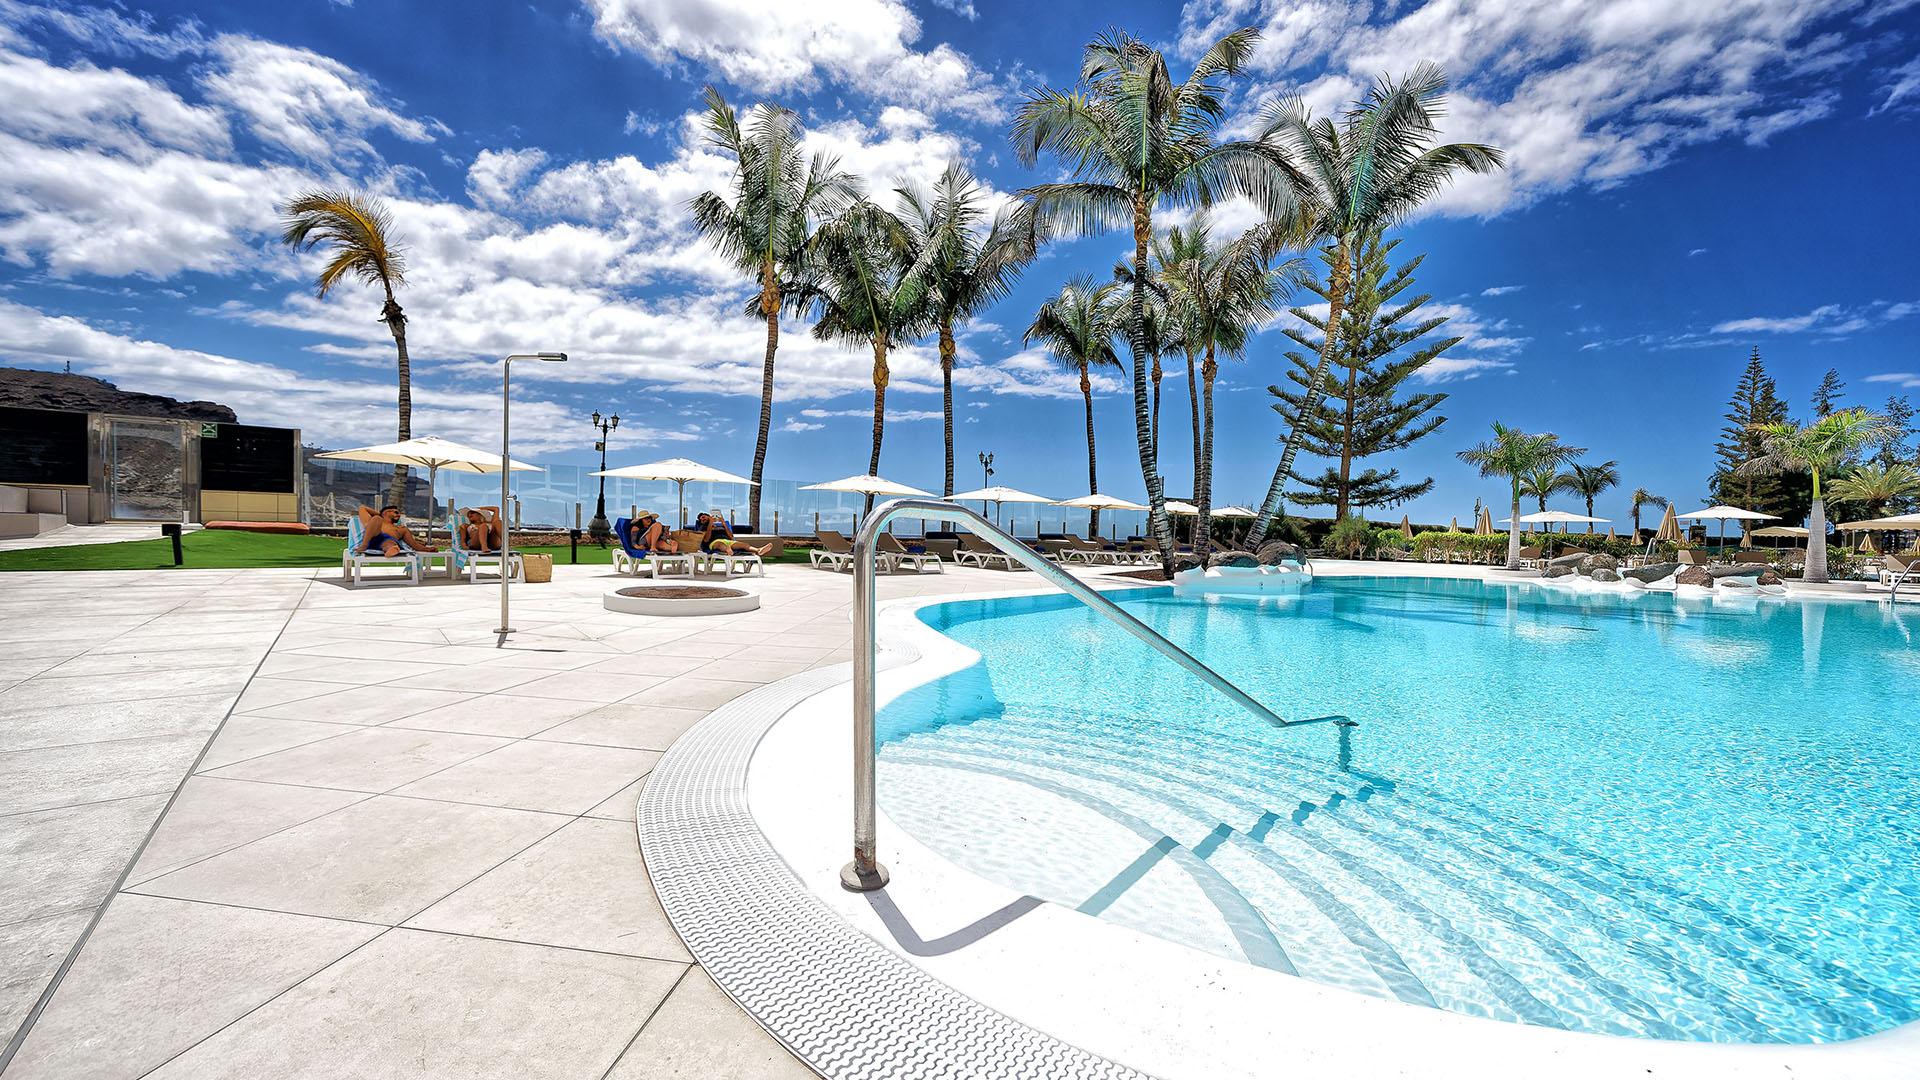 labranda-costa-mogan-hotel-gran-canaria 3626